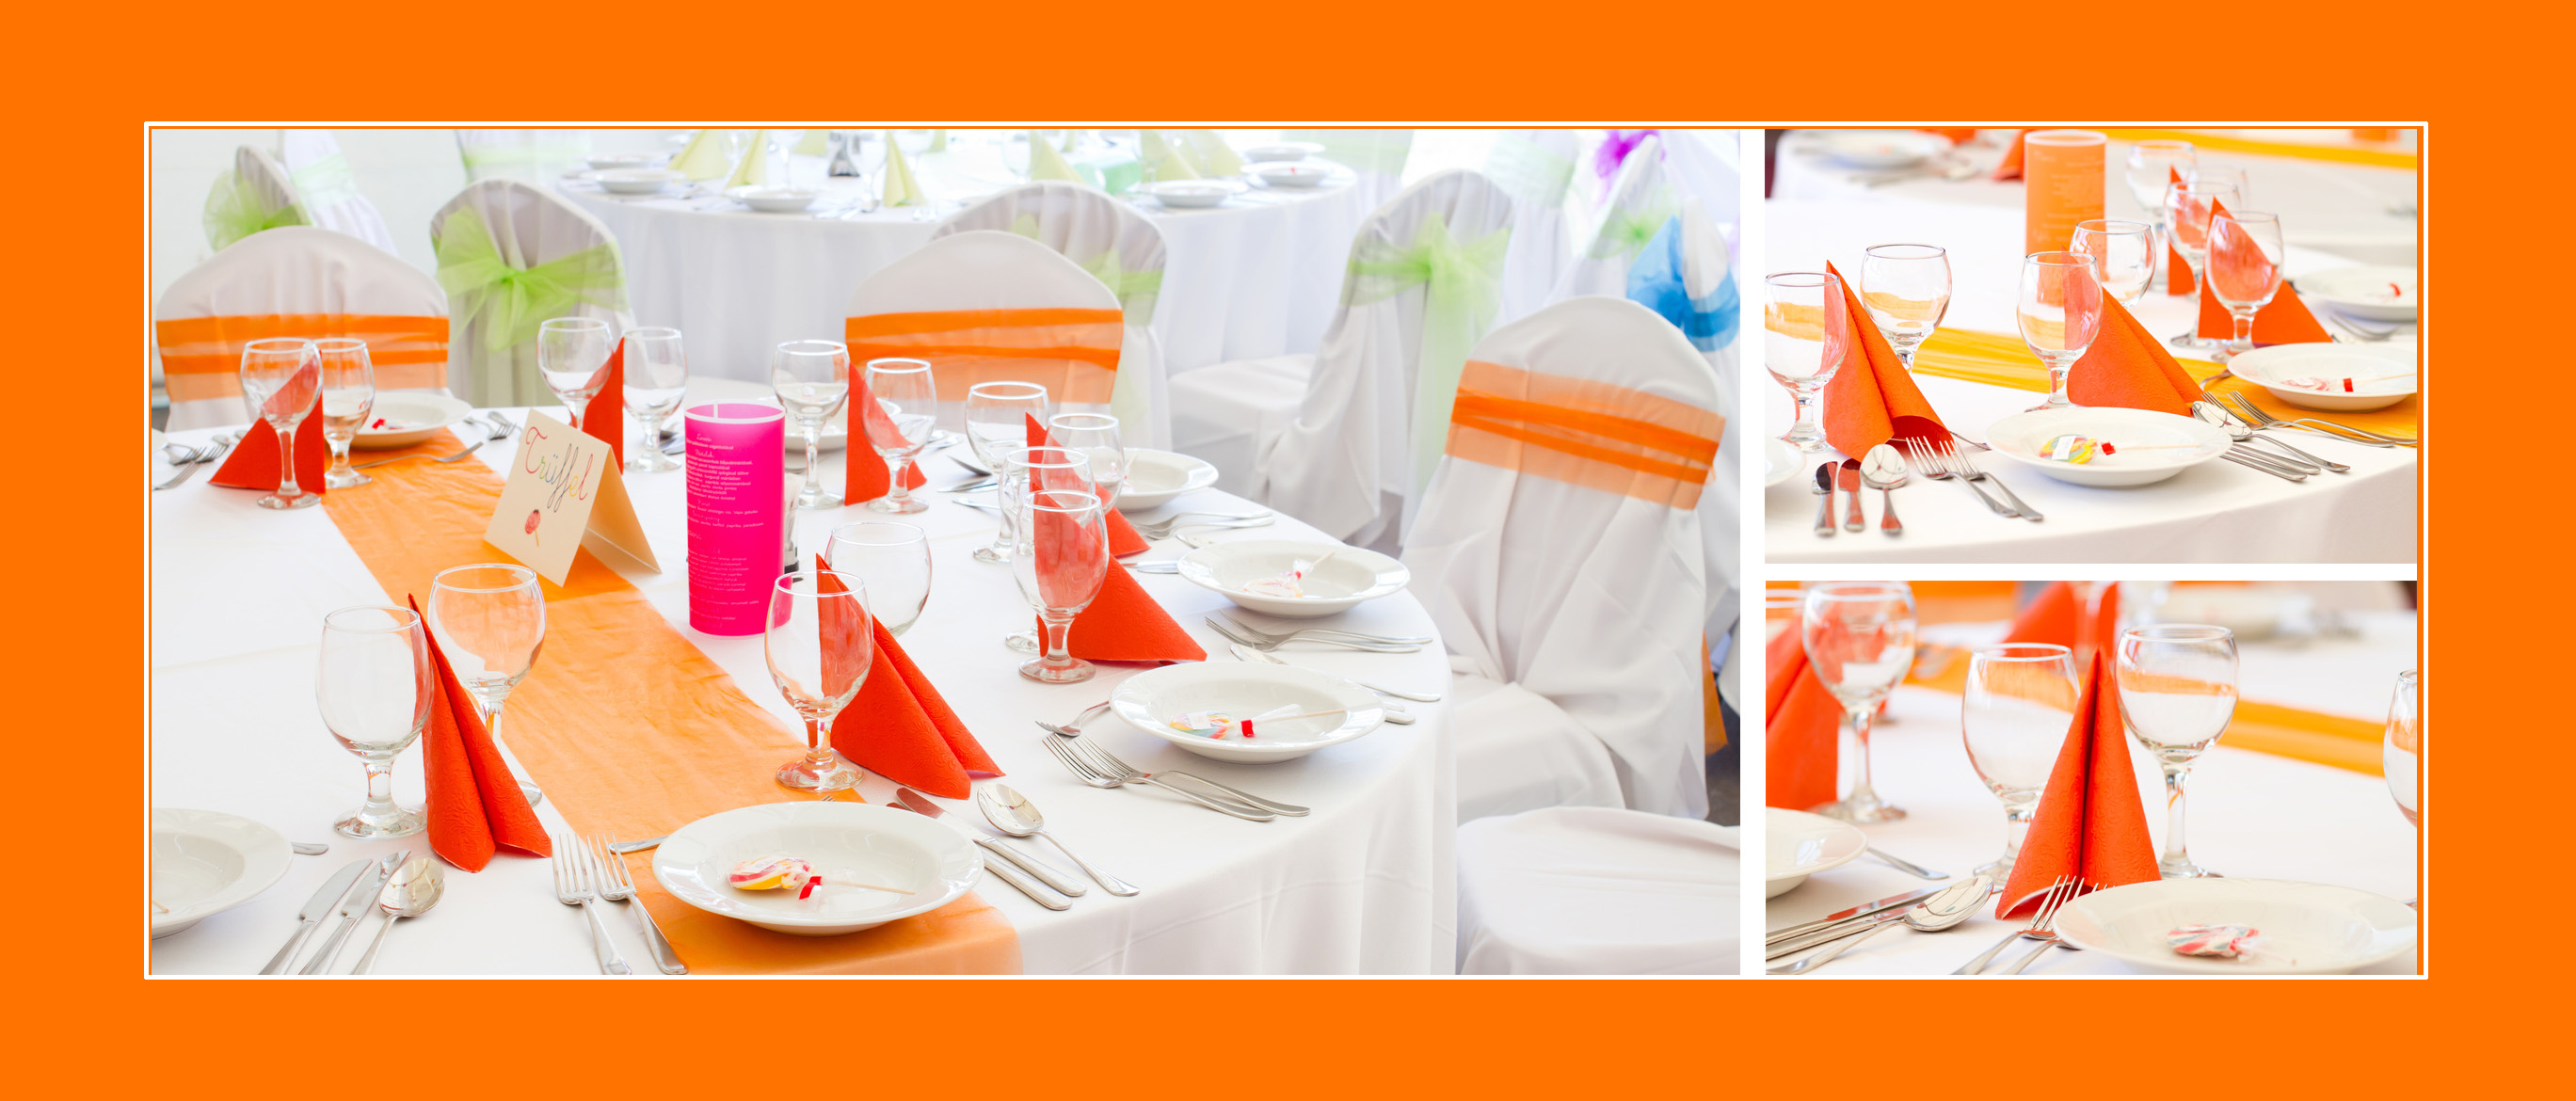 Geburtstagstischdeko in Orange/Pastellorange